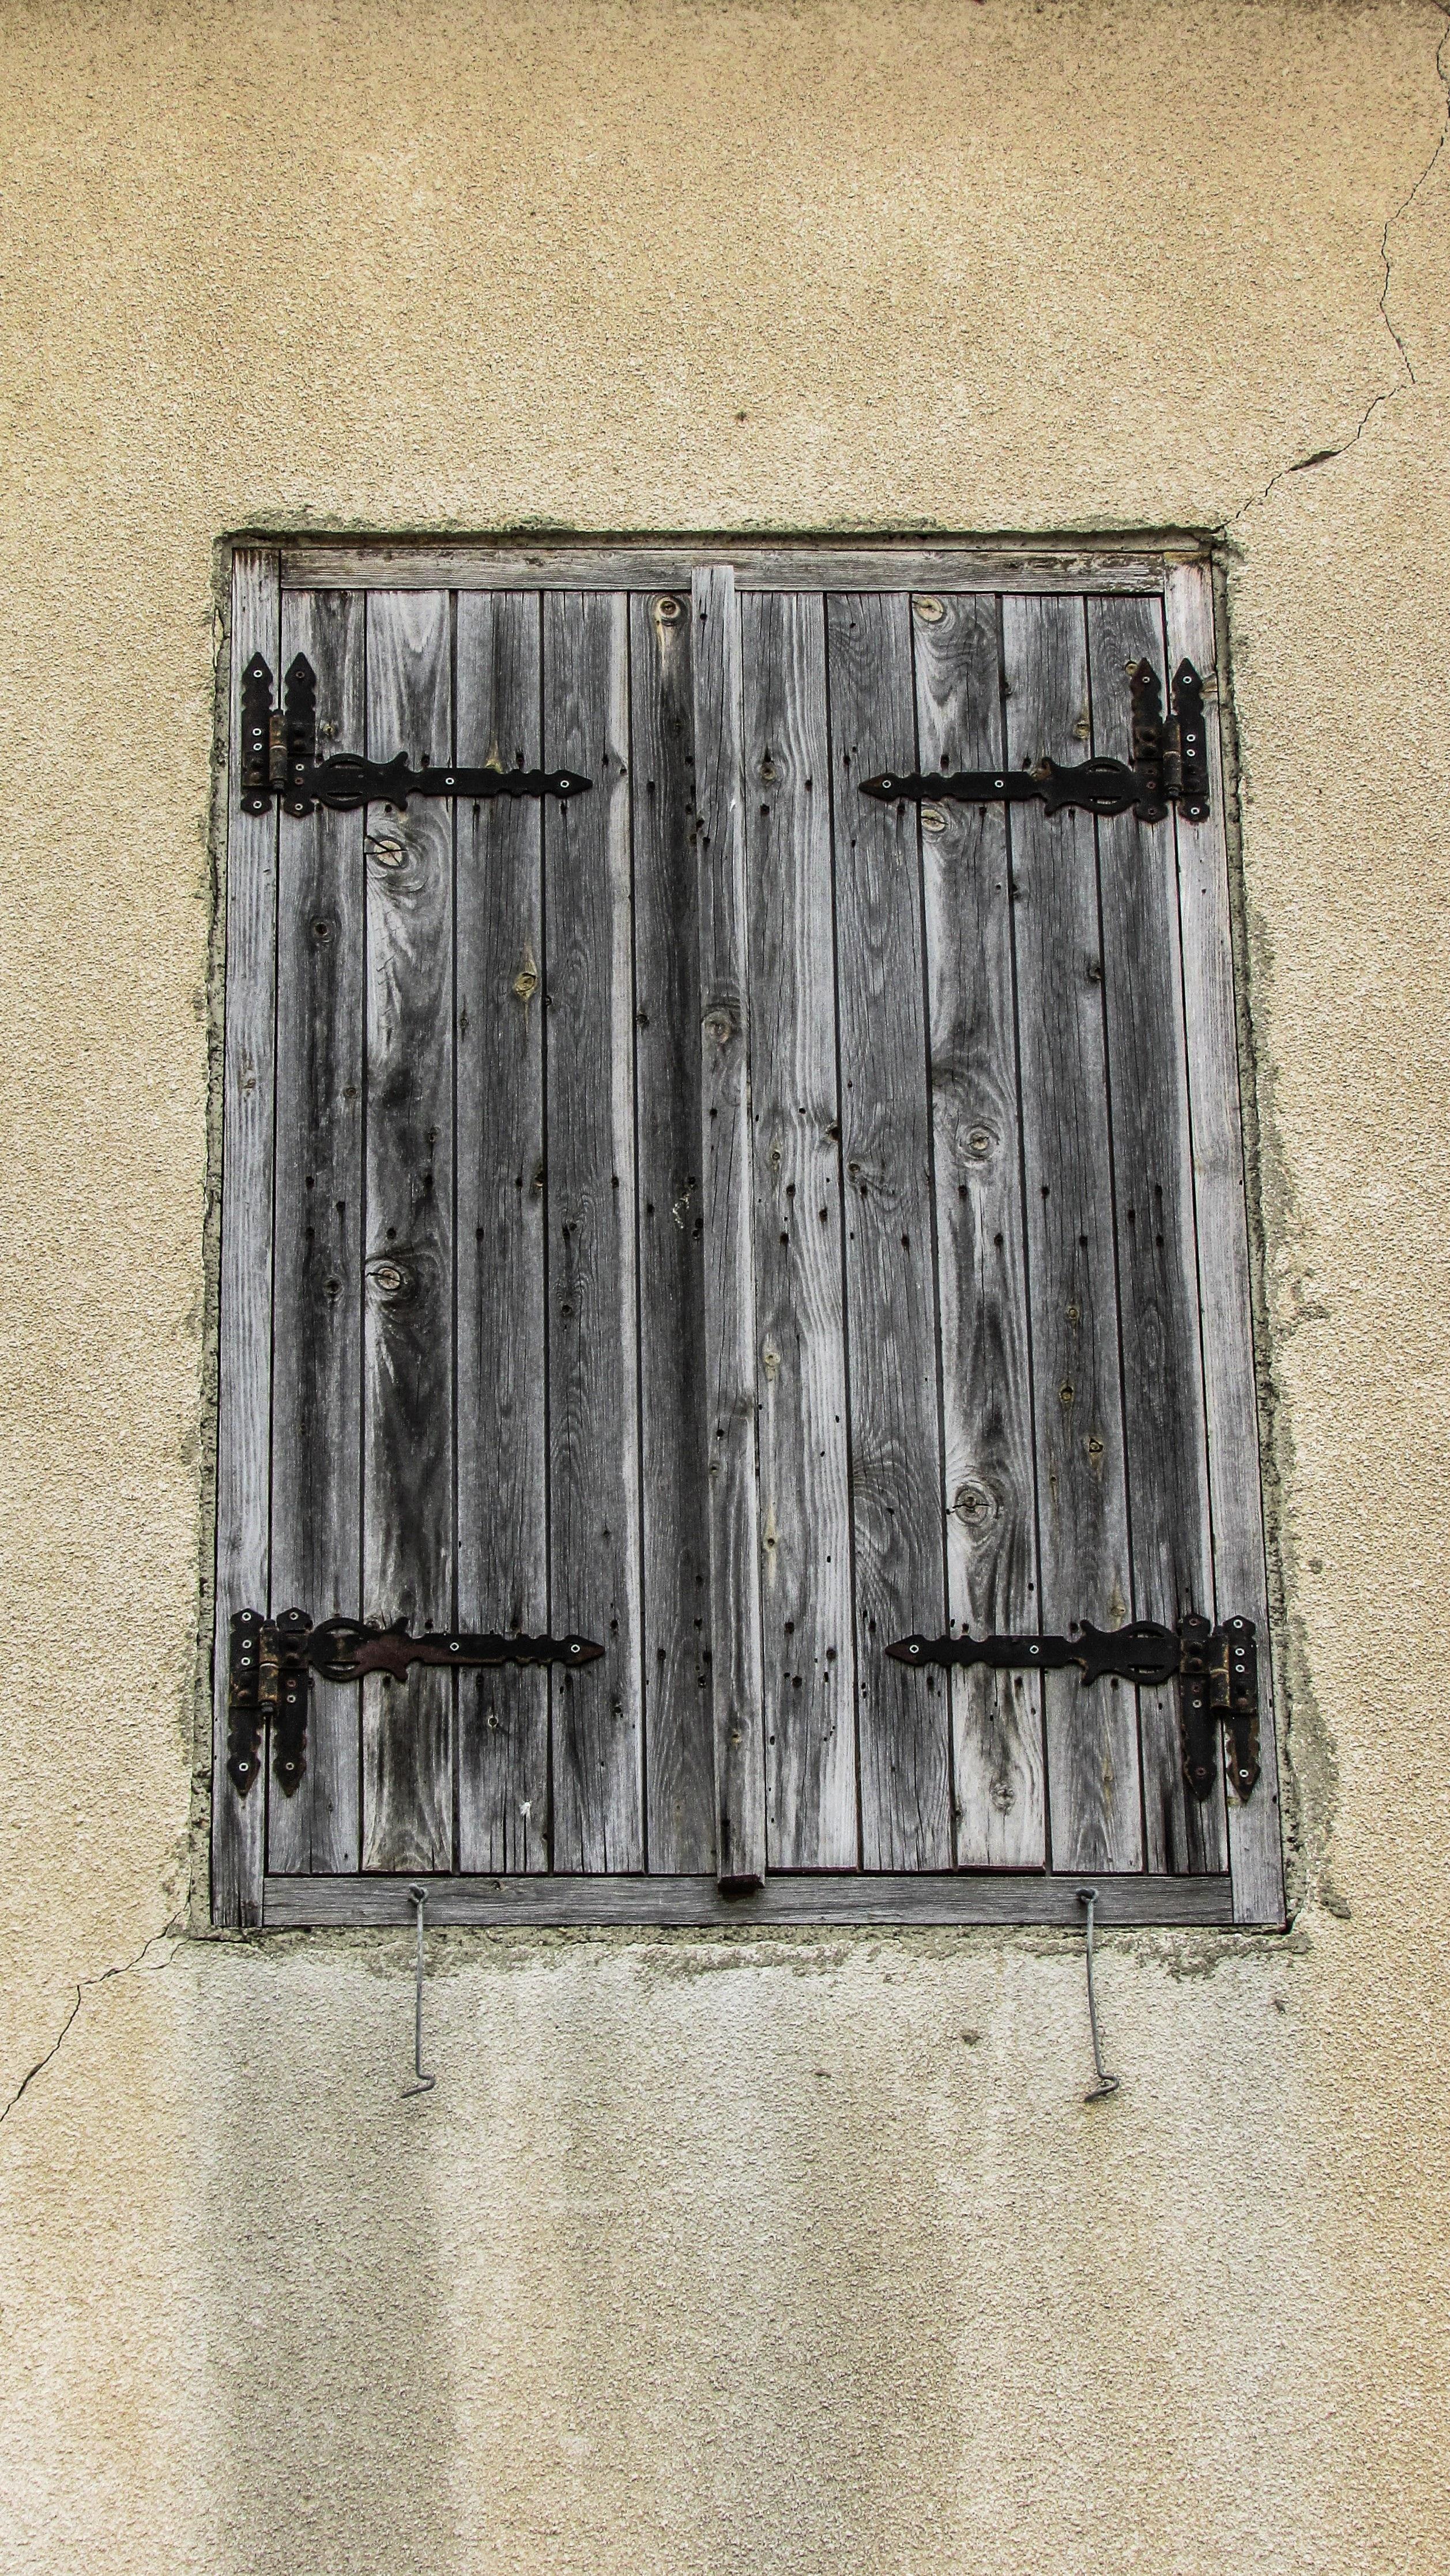 Fotos Gratis Arquitectura Madera Ventana Pared Pueblo L Nea  ~ Puertas Hierro Exterior Fachadas